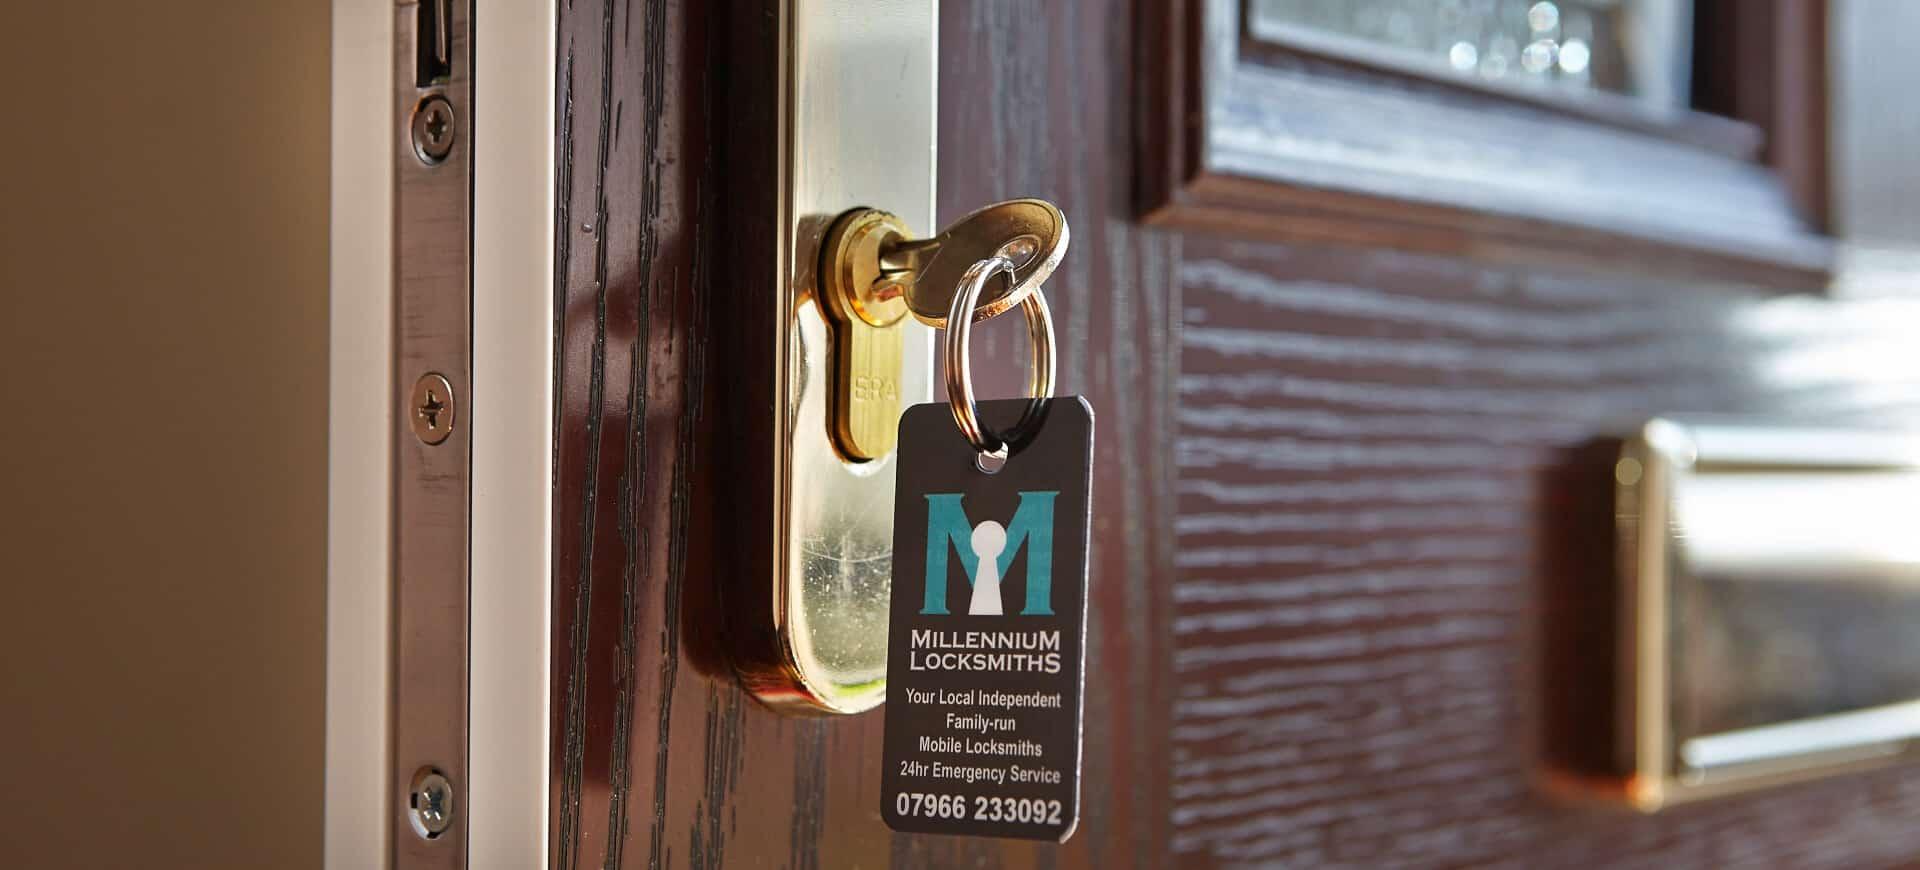 Millennium Locksmith Tag on Newly Installed Lock